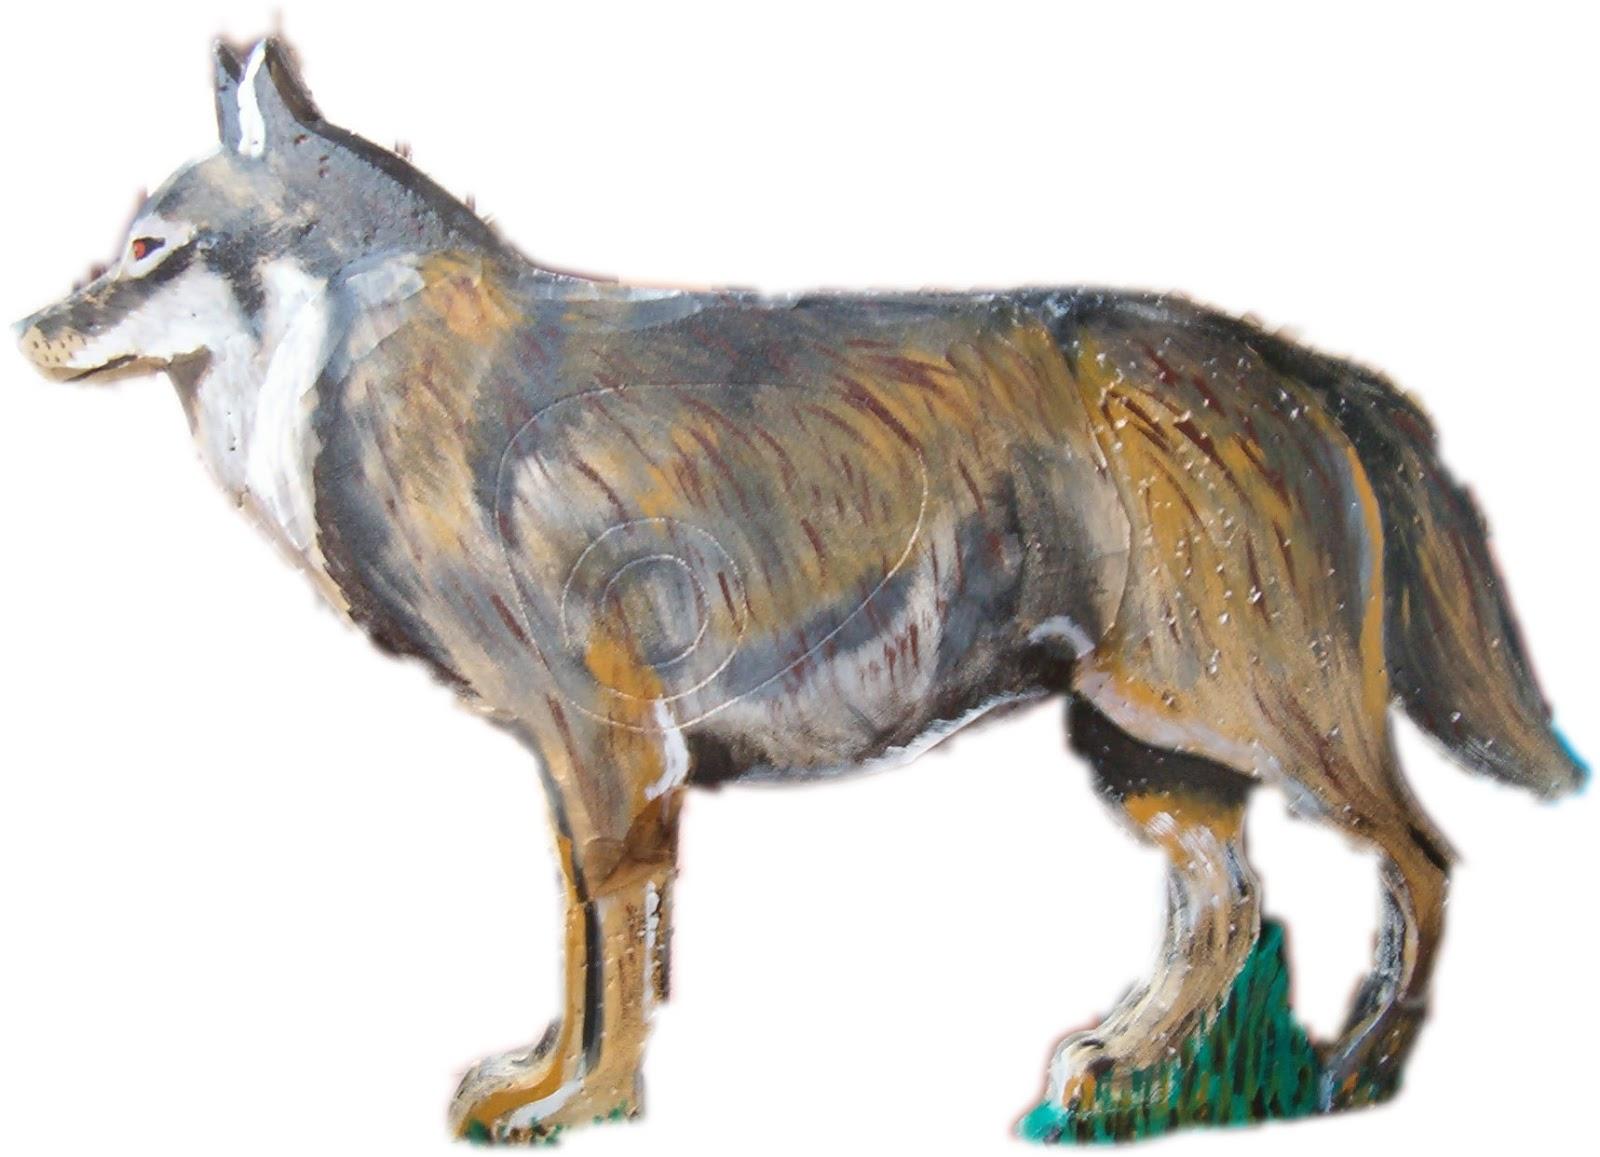 Colección De Silueta De Lobo: SILUETAS DE ALFACAR: CARNÍVOROS. Lobo Ibérico